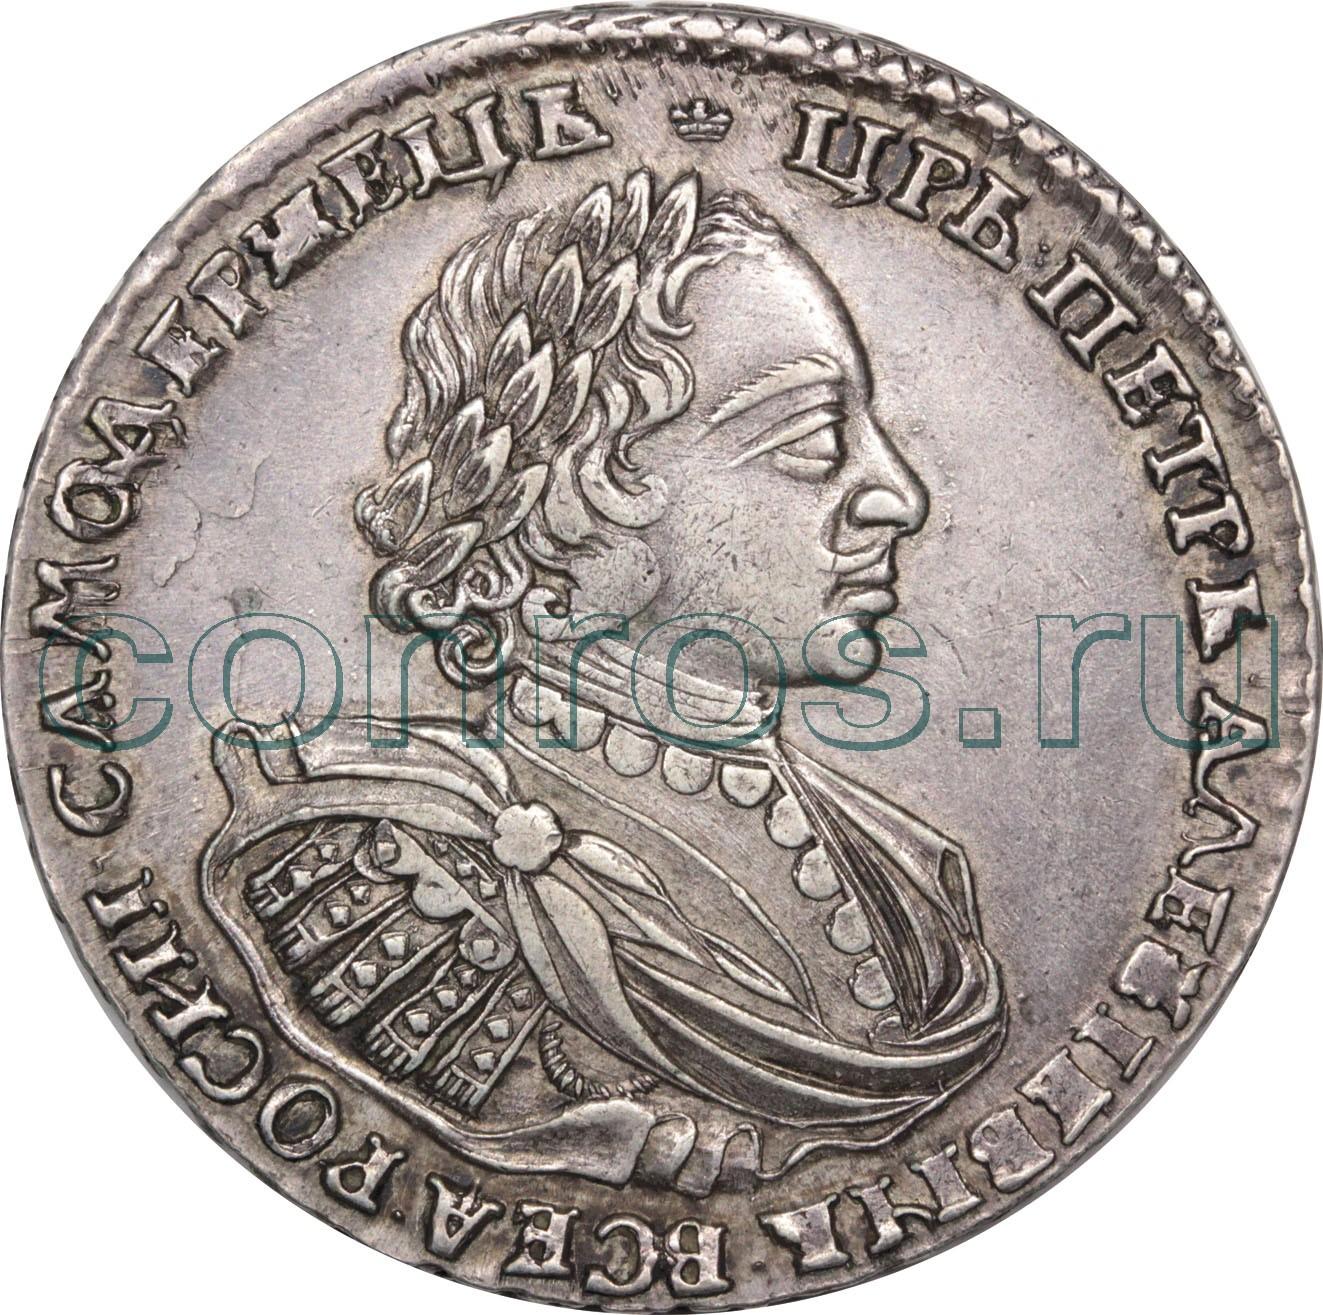 Монета самодержавец петр алексеевич цена адыгейский орнамент картинки